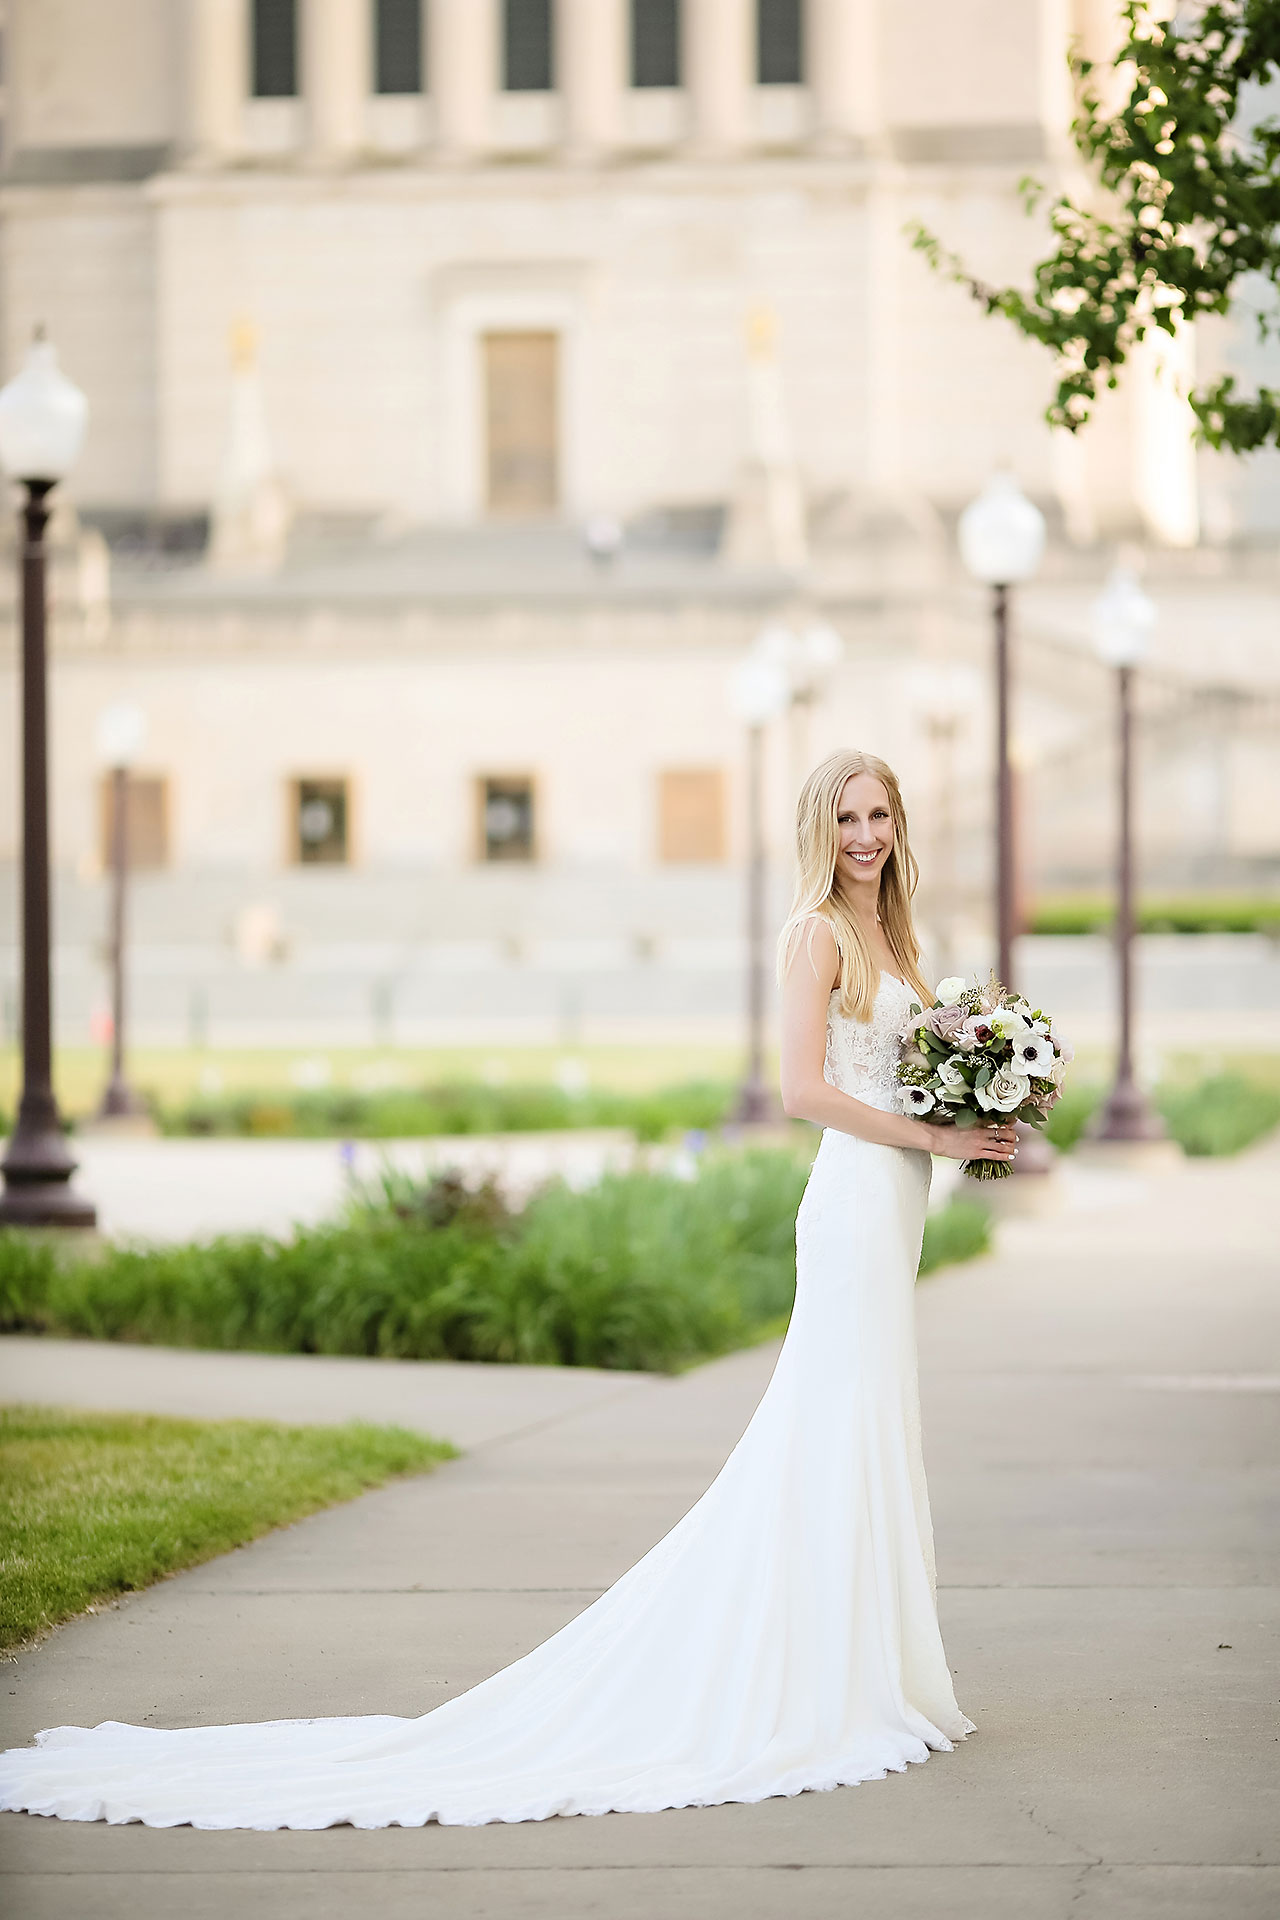 Molly Declan Scottish Rite Indianapolis Wedding 222